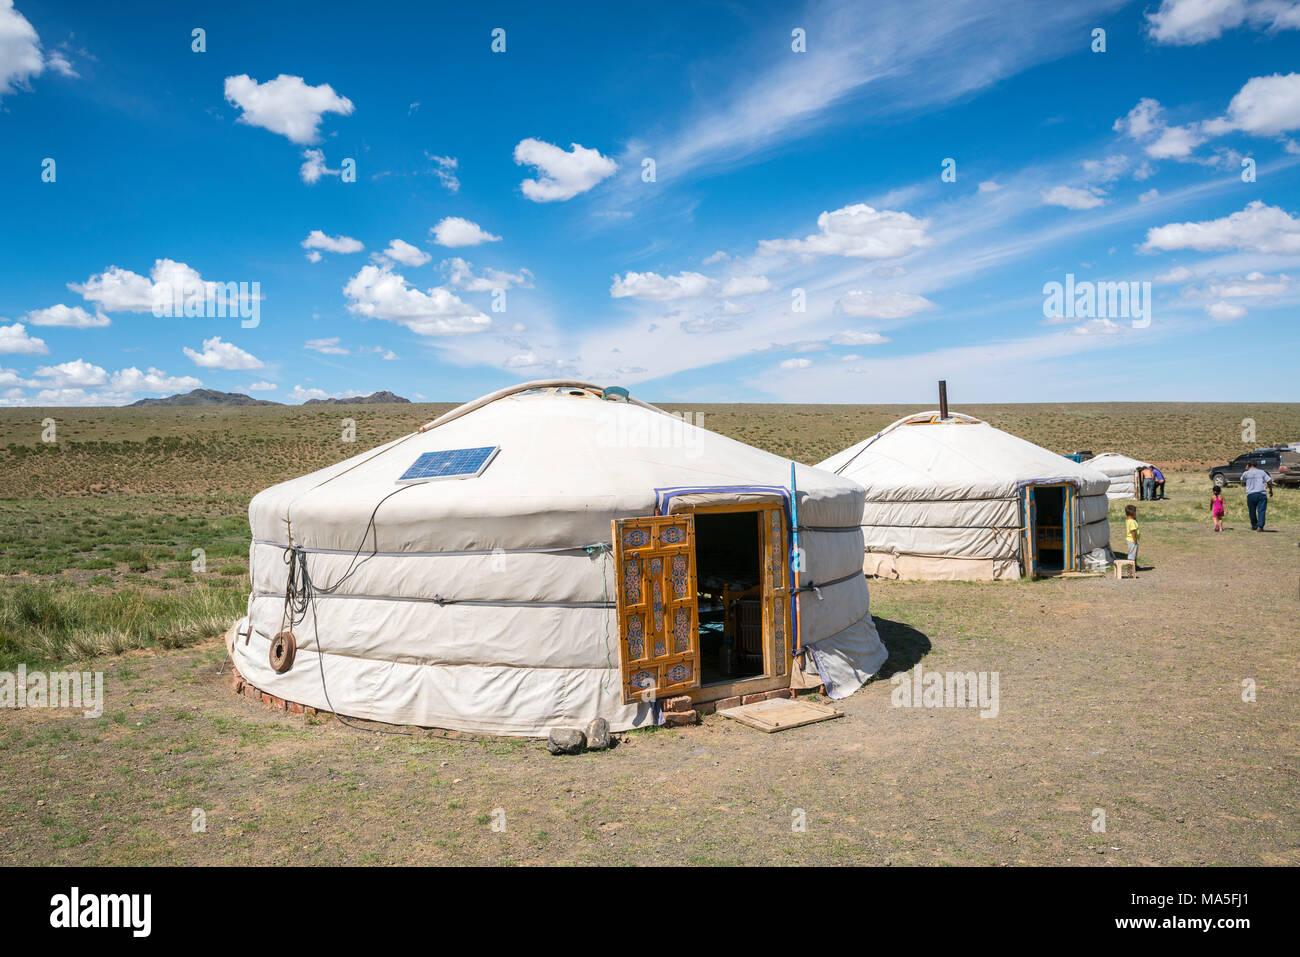 Mongolian traditional nomadic gers. Bayandalai district, South Gobi province, Mongolia. - Stock Image